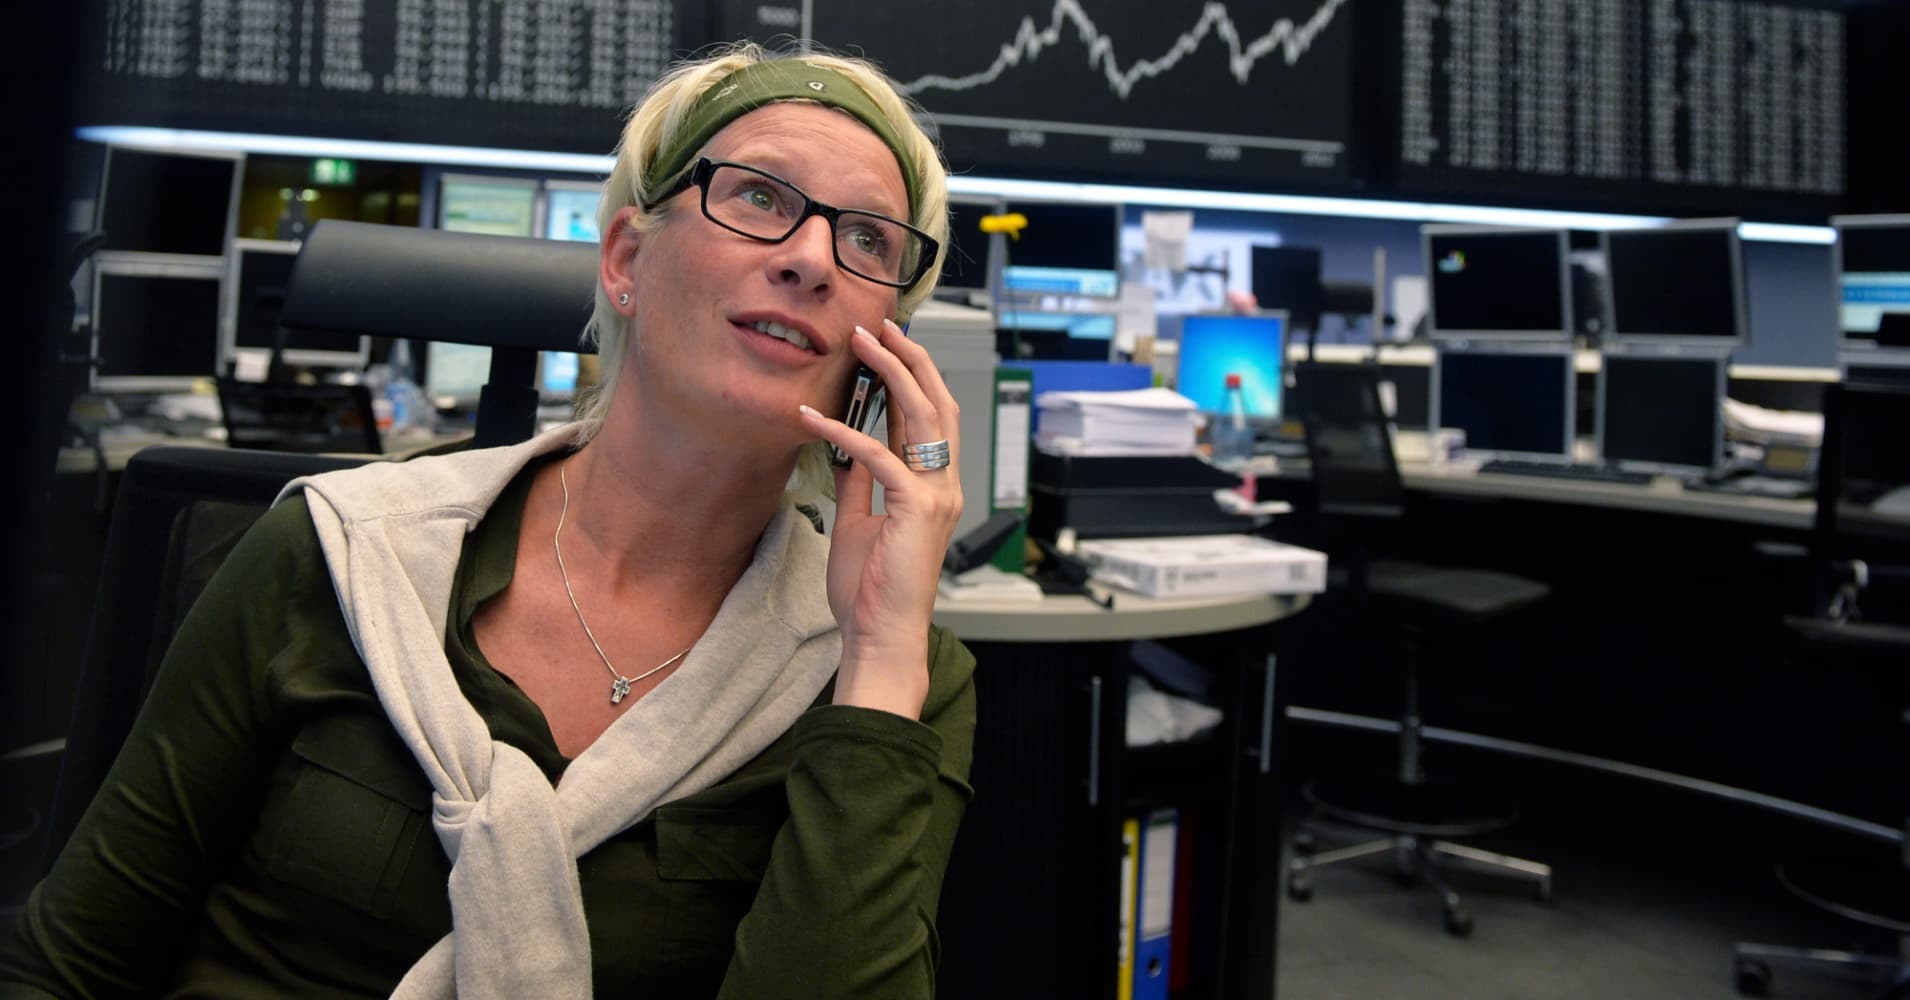 European stocks rebound as geopolitical fears abate; Aston Martin shares tumble